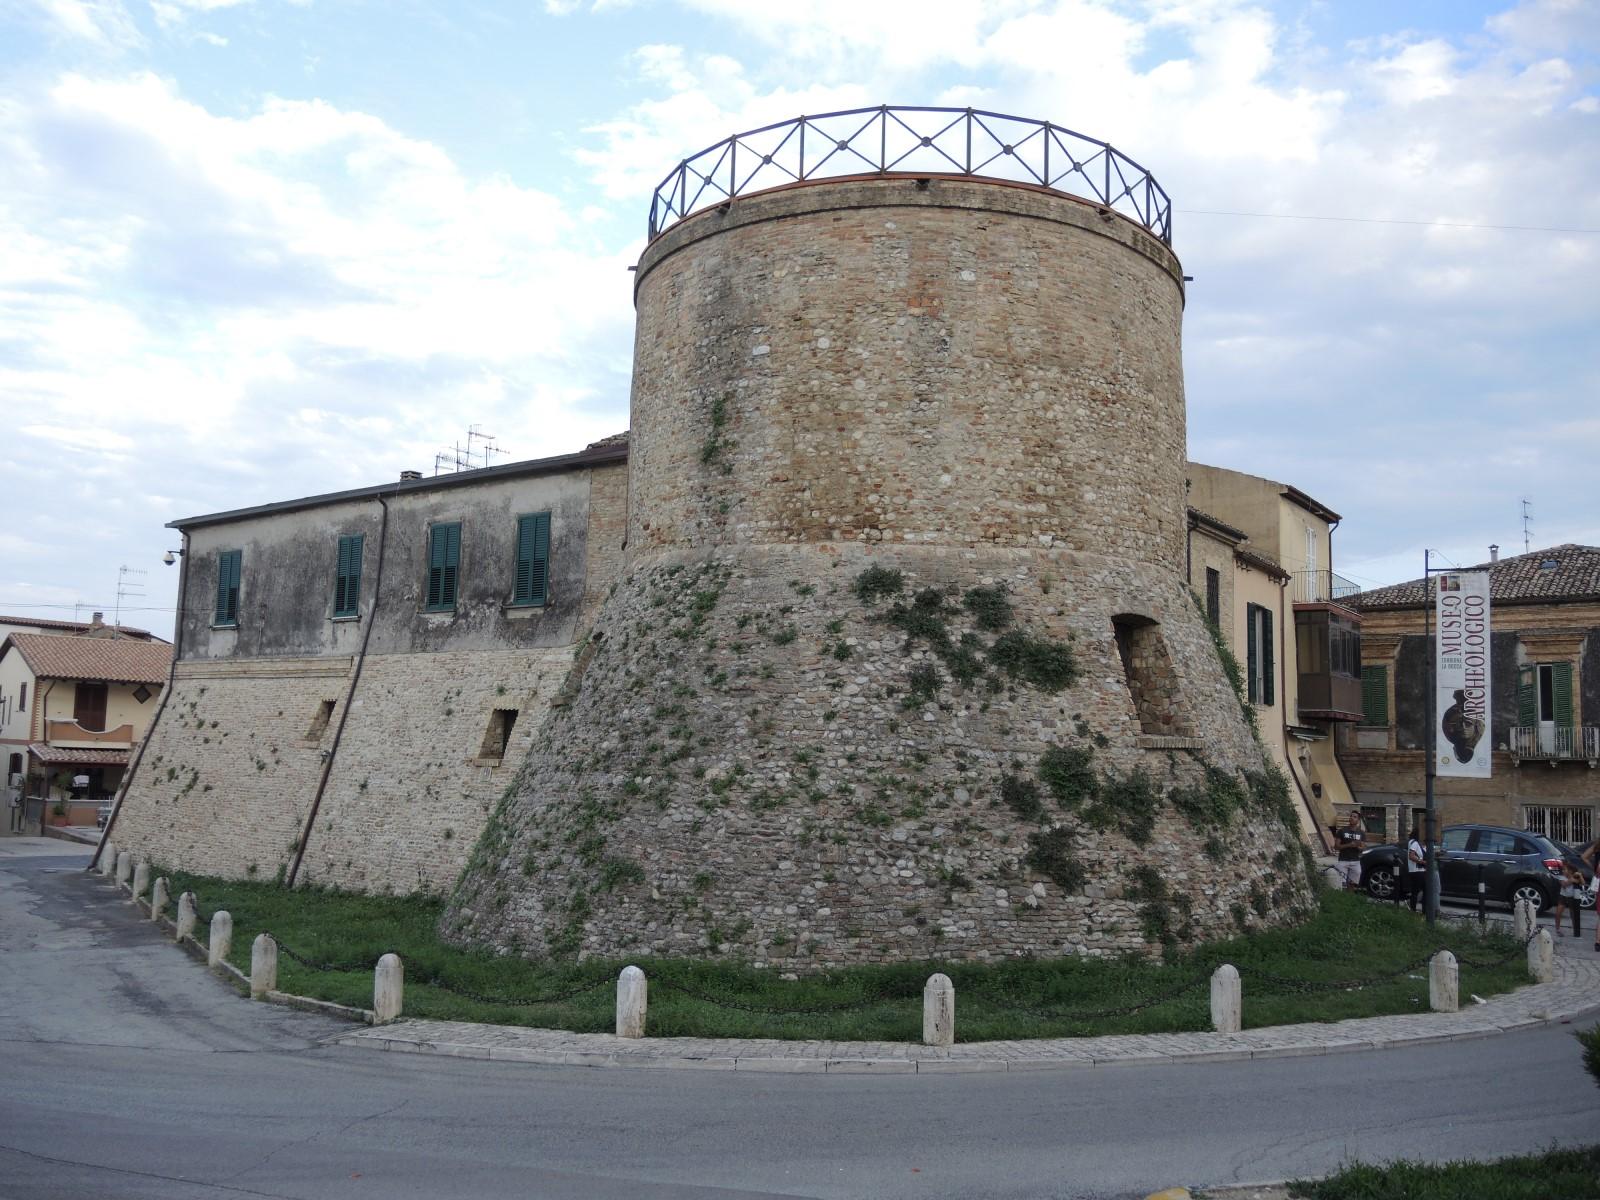 Giulianova Abruzzo Landscape Beautiful Hotel 900 Torrione History Castrumnovum